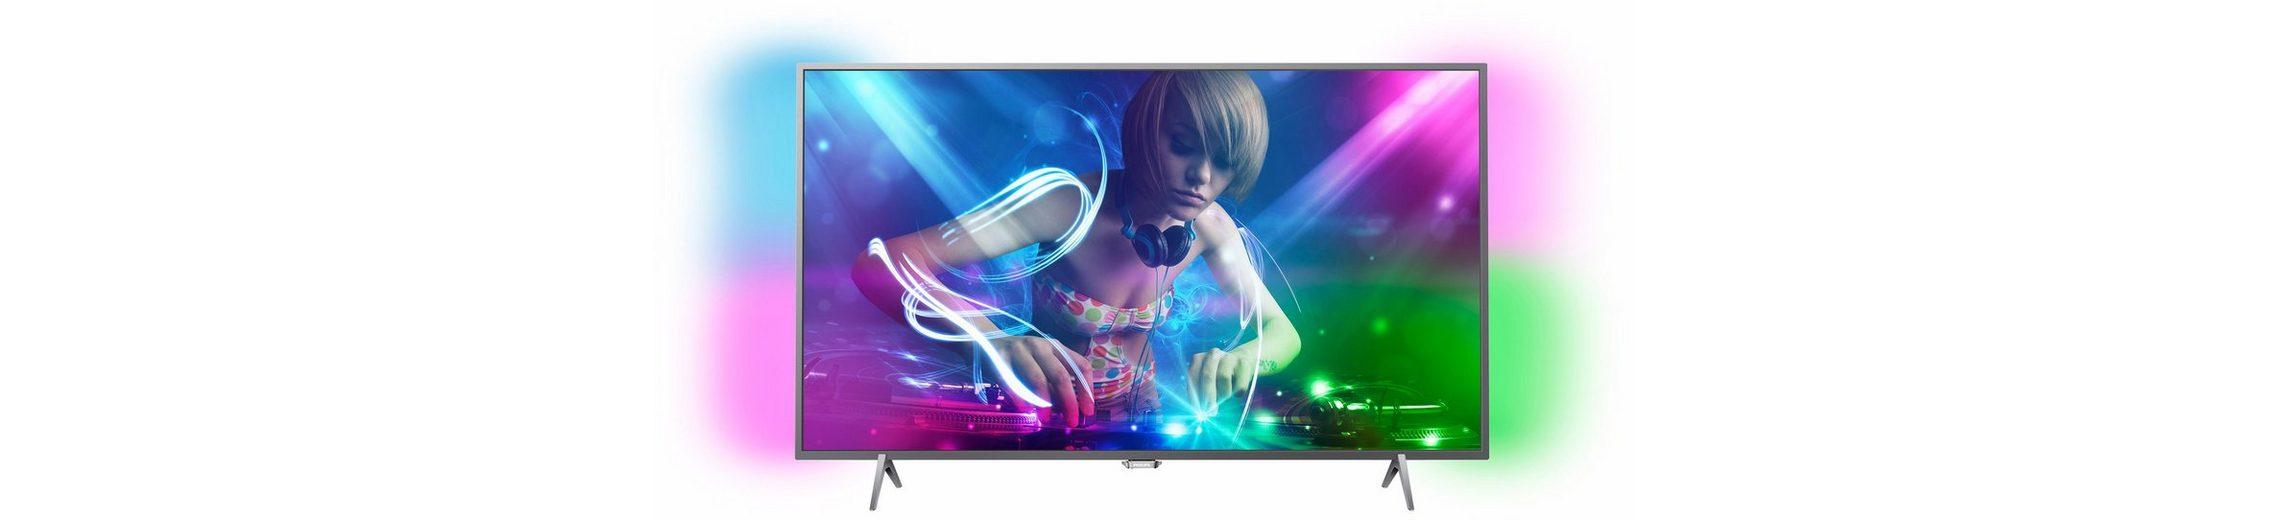 Philips 43PUS6401/12 LED TV (108 cm (43 Zoll), Ultra HD, Ambilight) inkl. 36 Monate Garantie